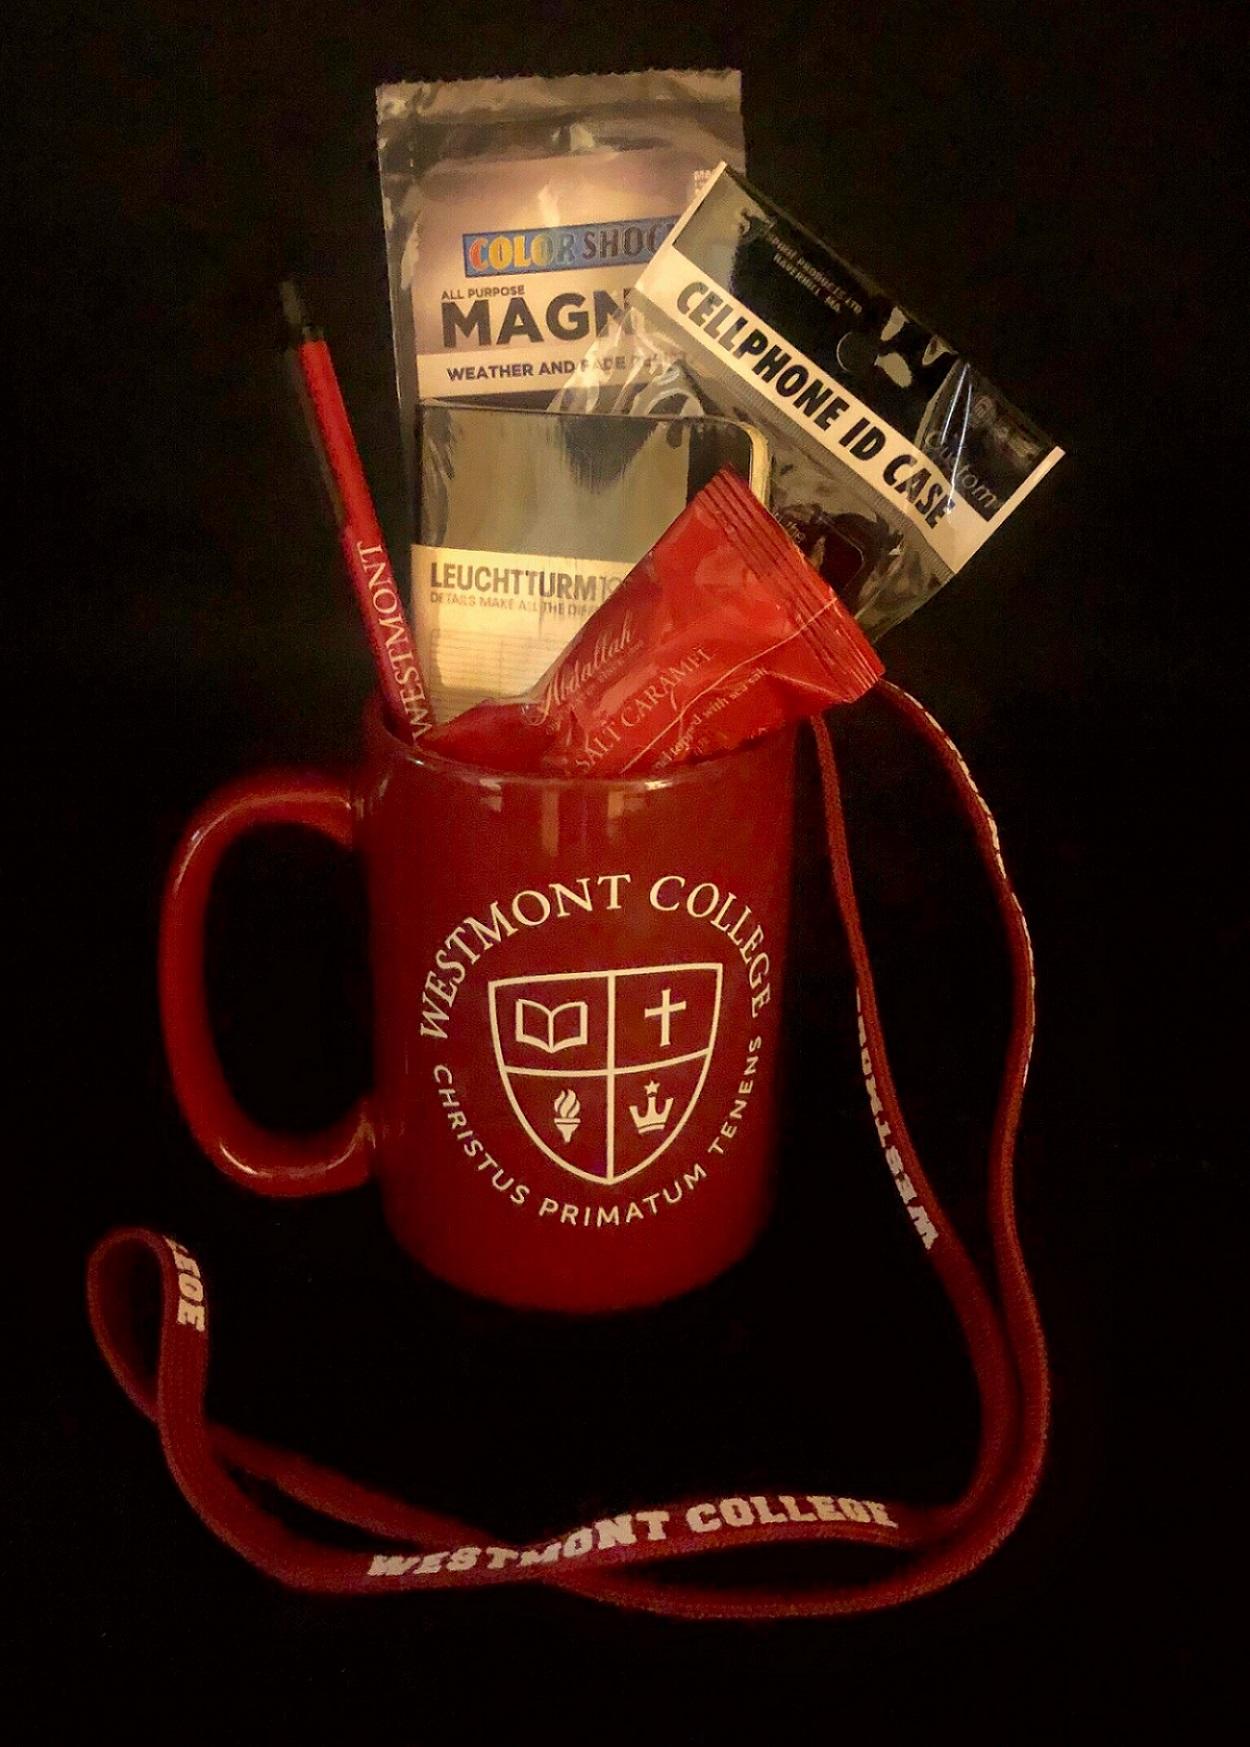 Image for the Gift Basket Westmont Basics product